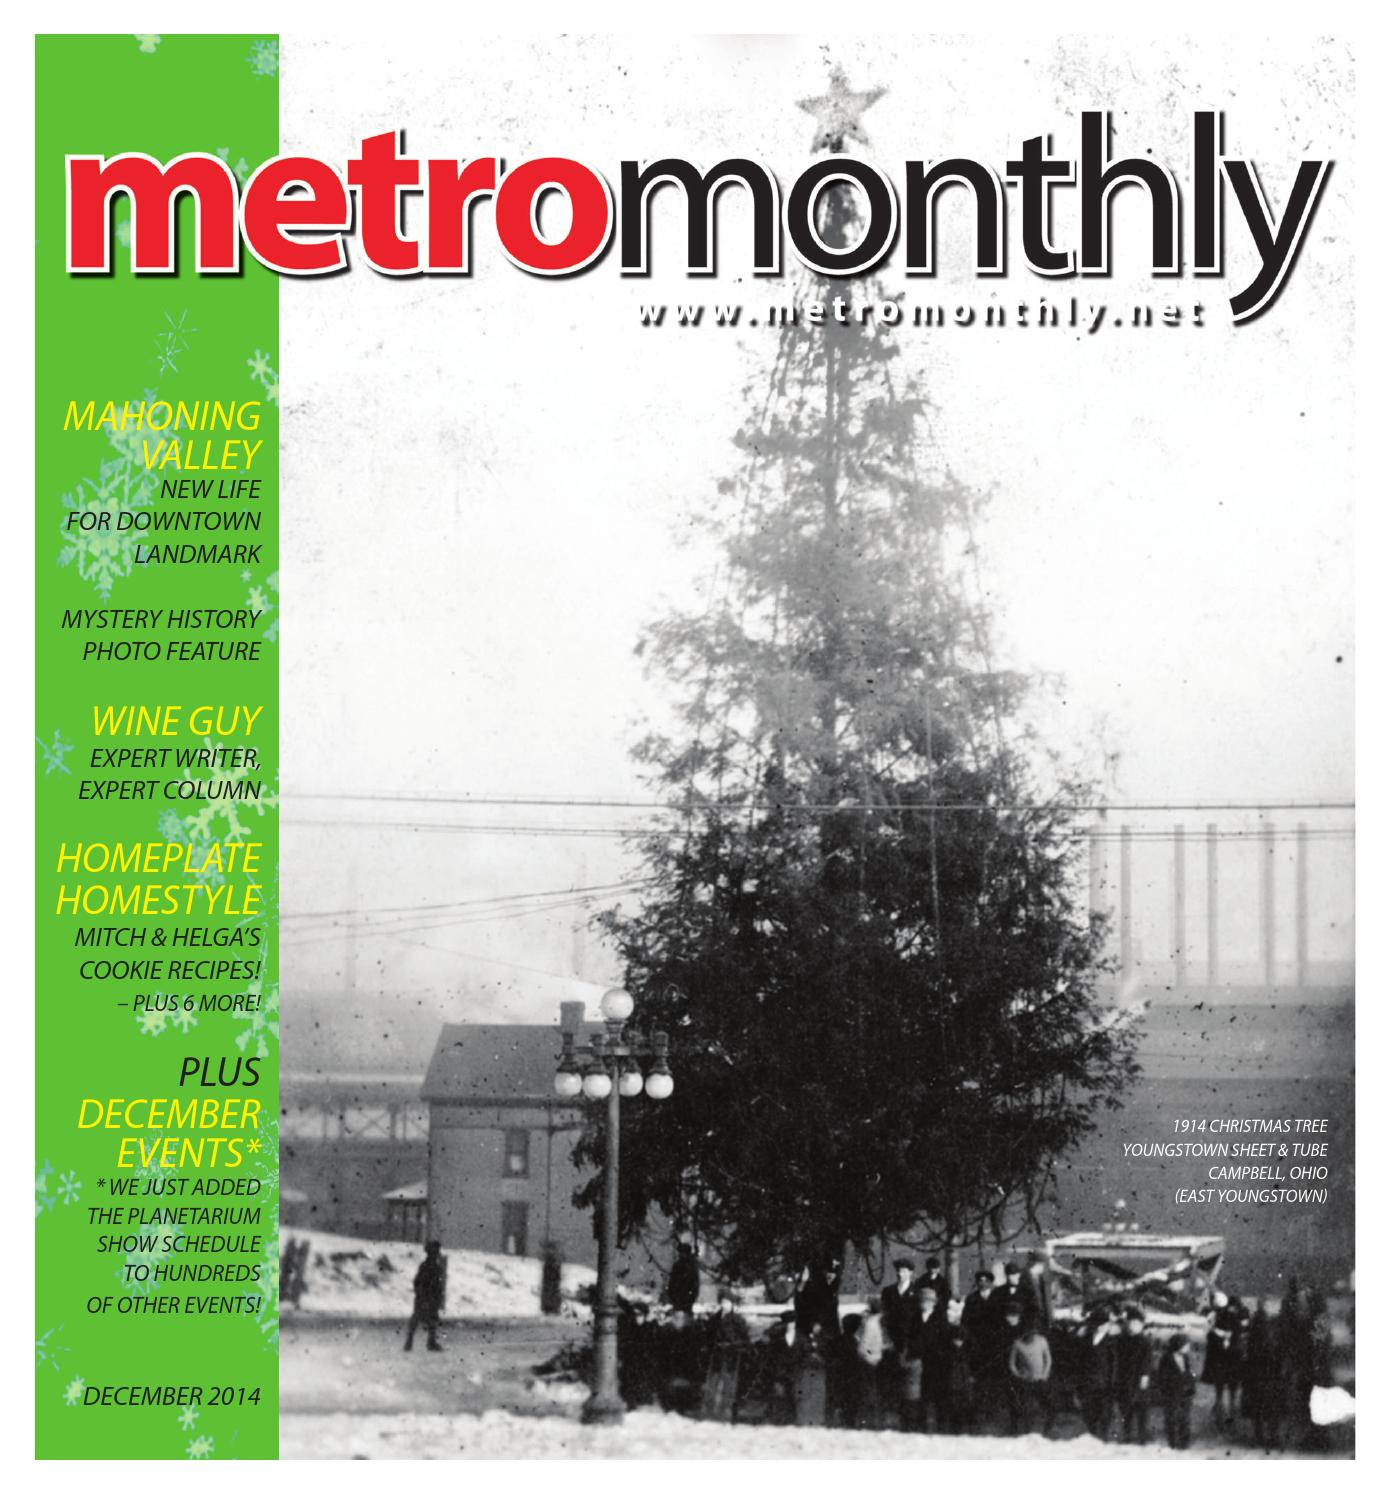 Metro Monthly DEC 2014 by Metro Monthly issuu